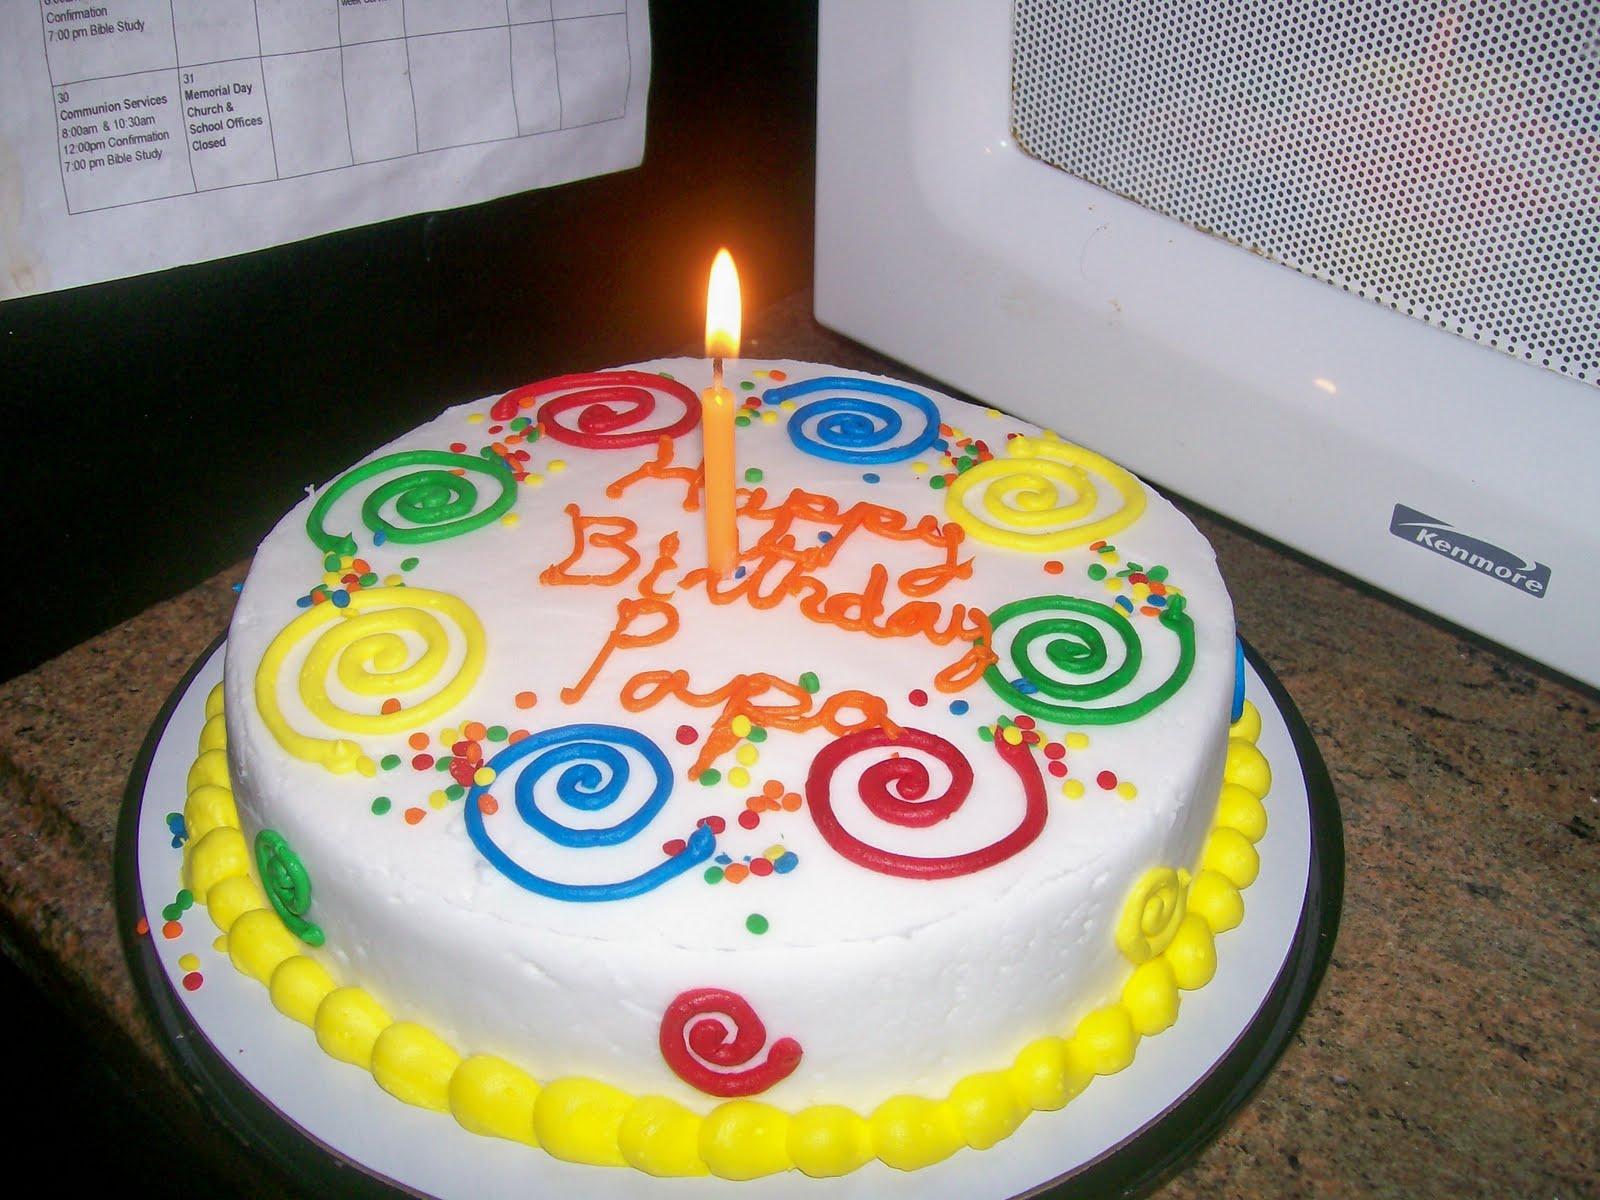 Images Of Papa Birthday Cake : Birthday wishes 4 papa